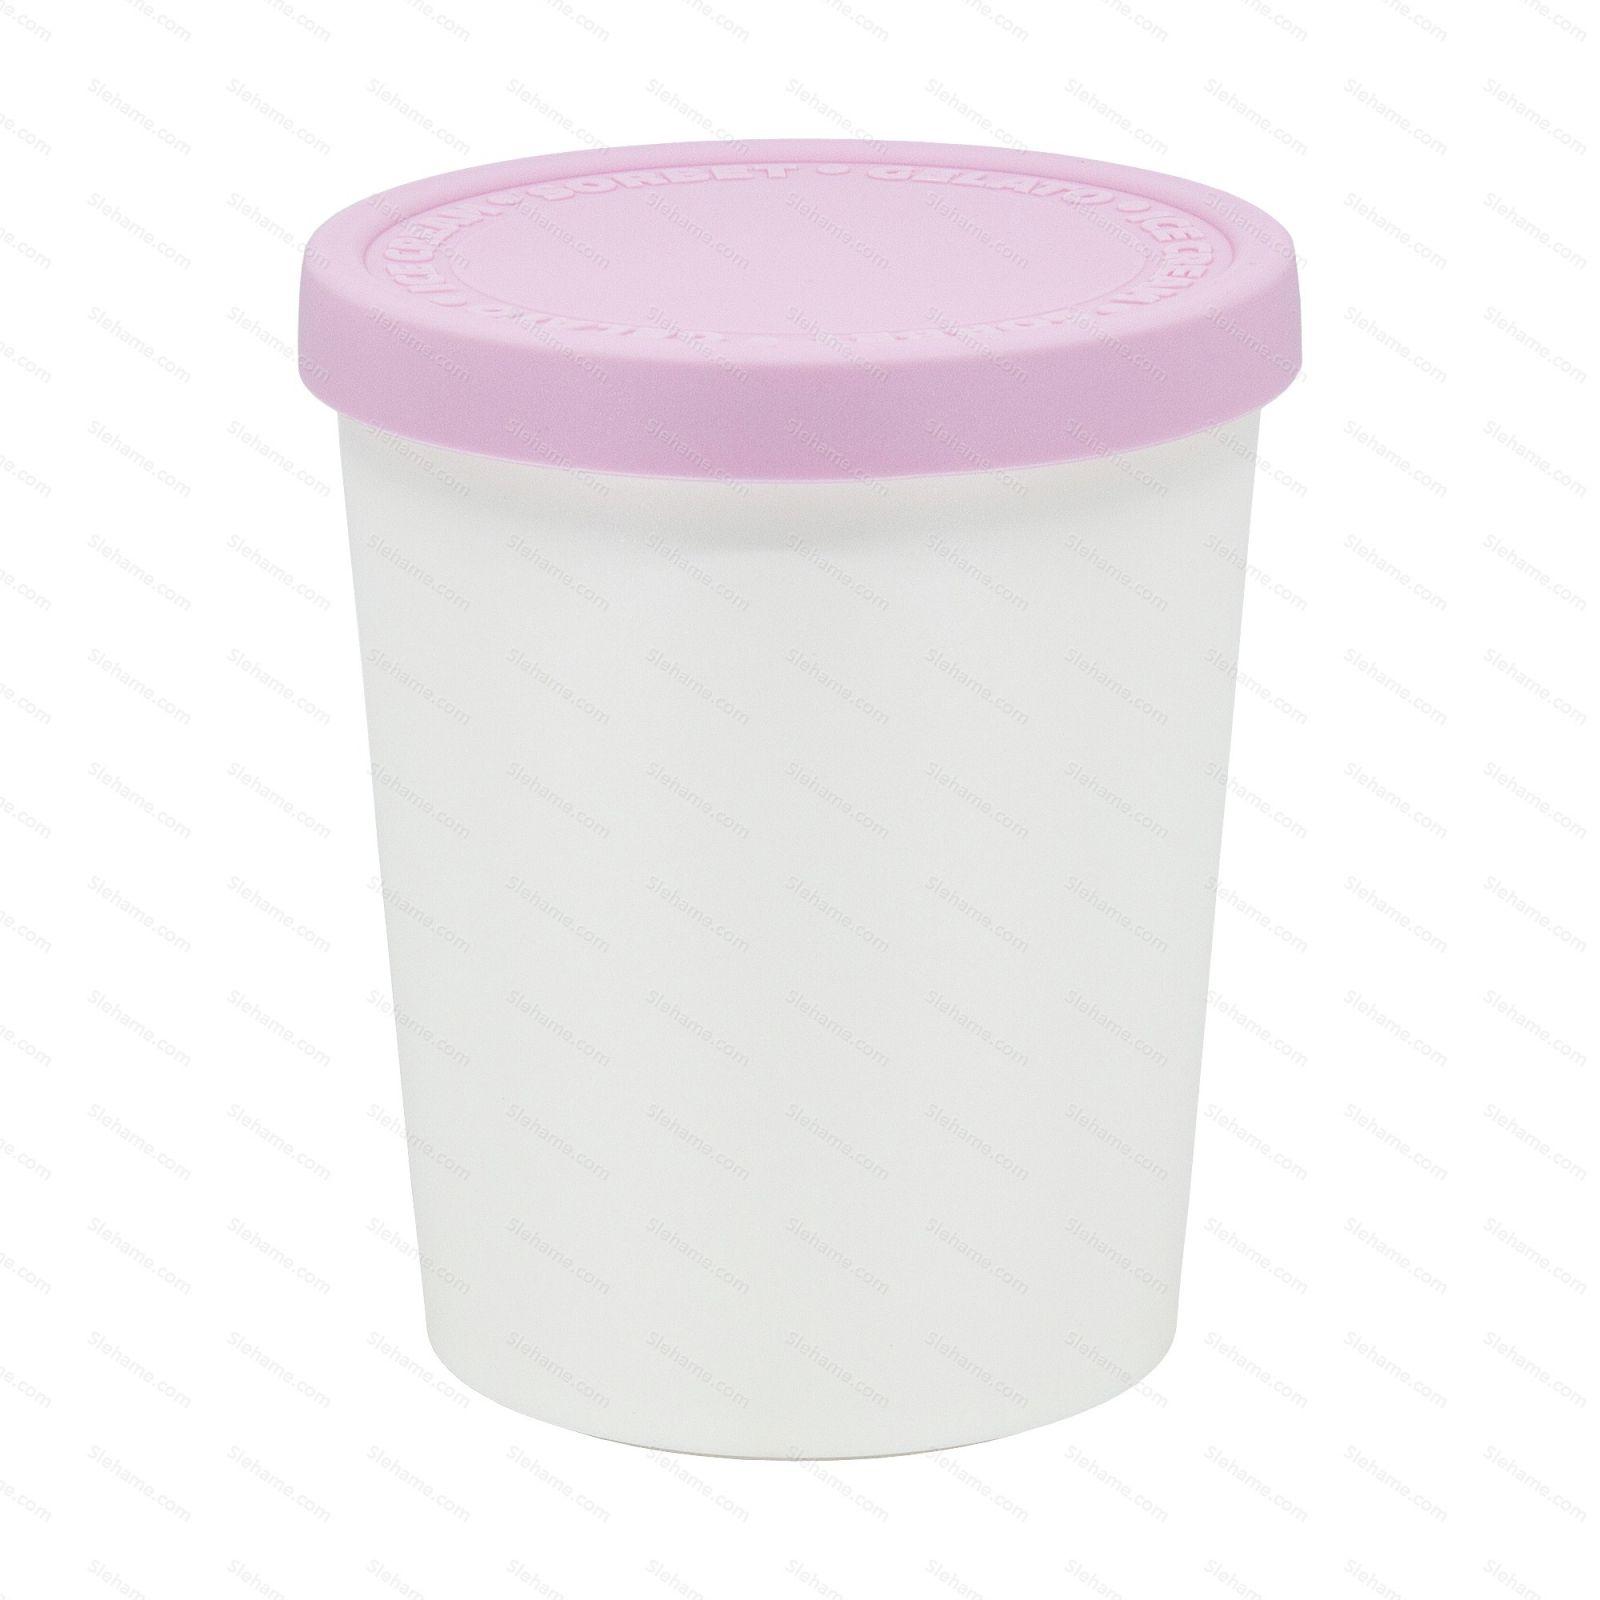 Ice cream tub Tovolo SWEET TREAT 1.0 l, pink